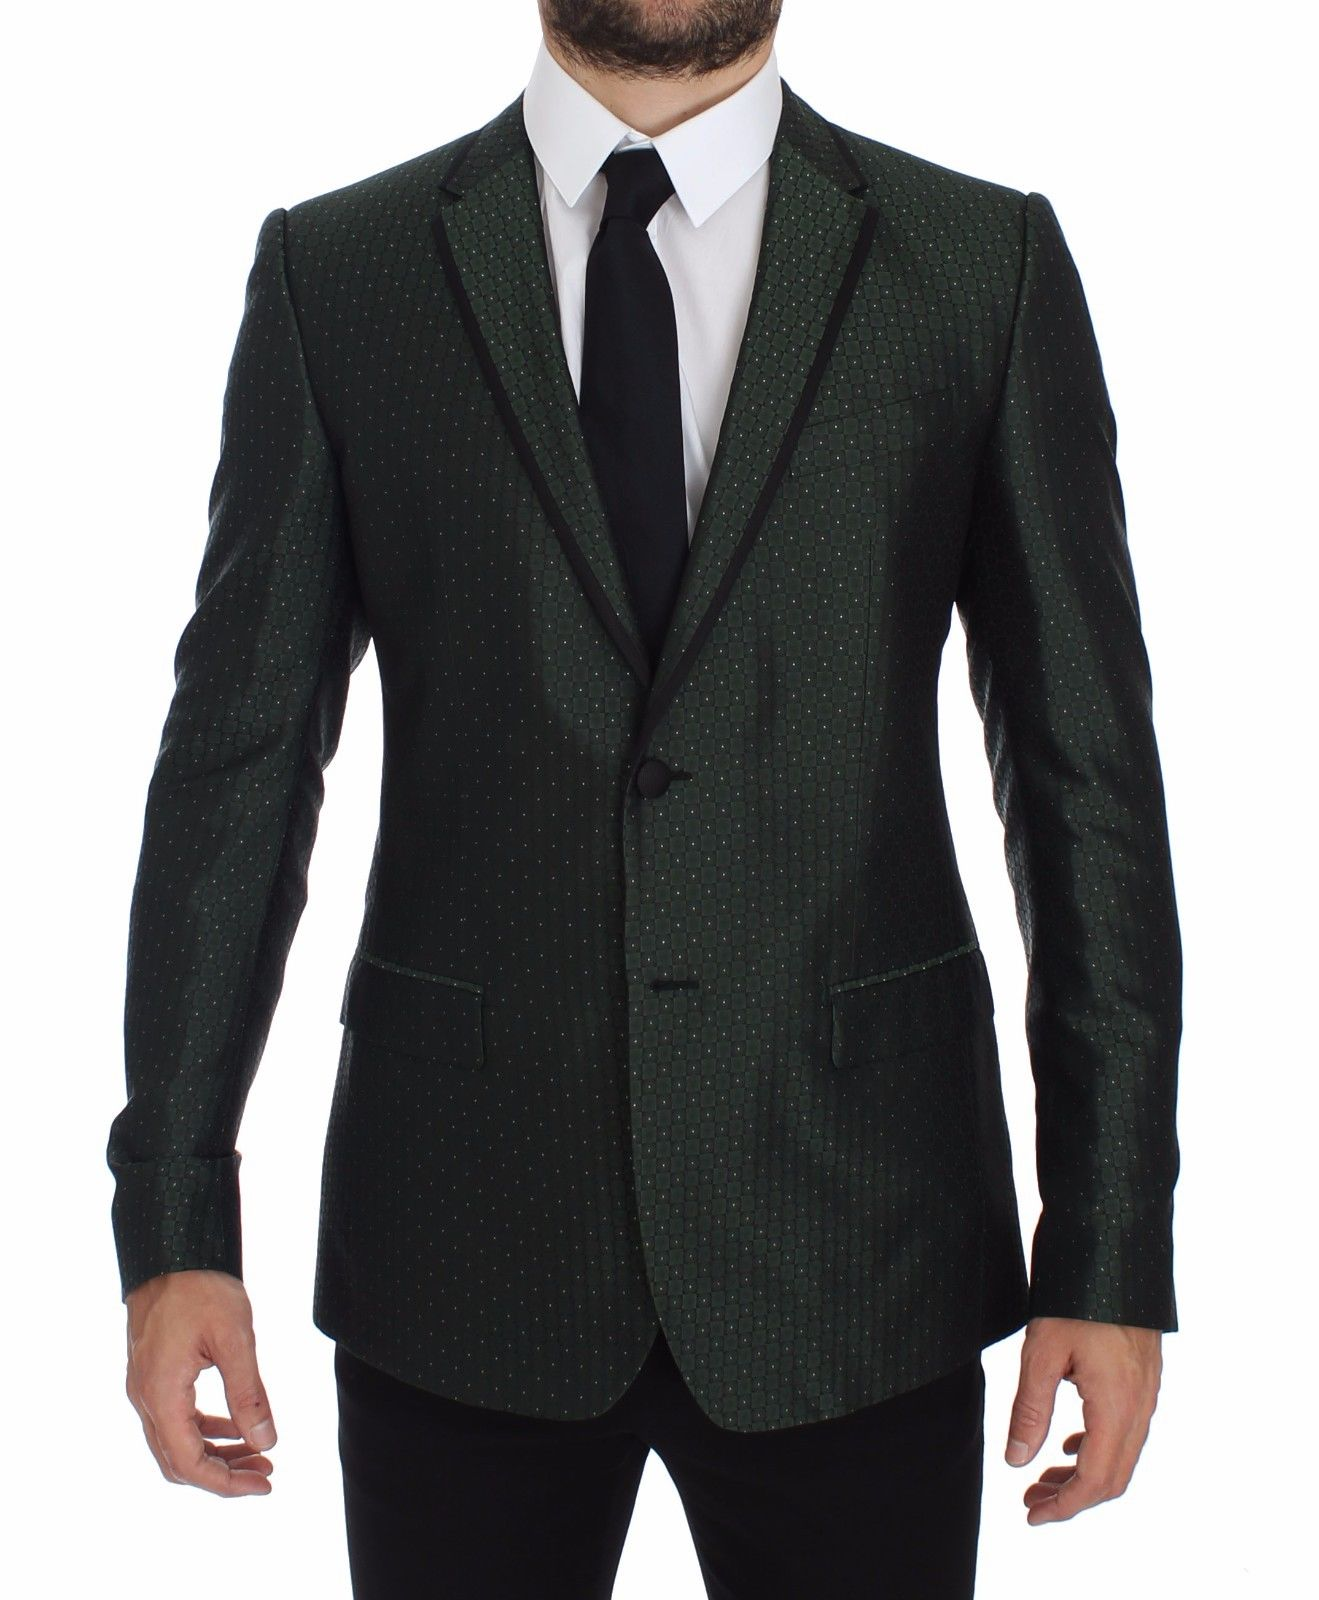 Dolce & Gabbana Men's Slim Fit Silk Two Button Blazer Green GTT10088 - IT44 | XS